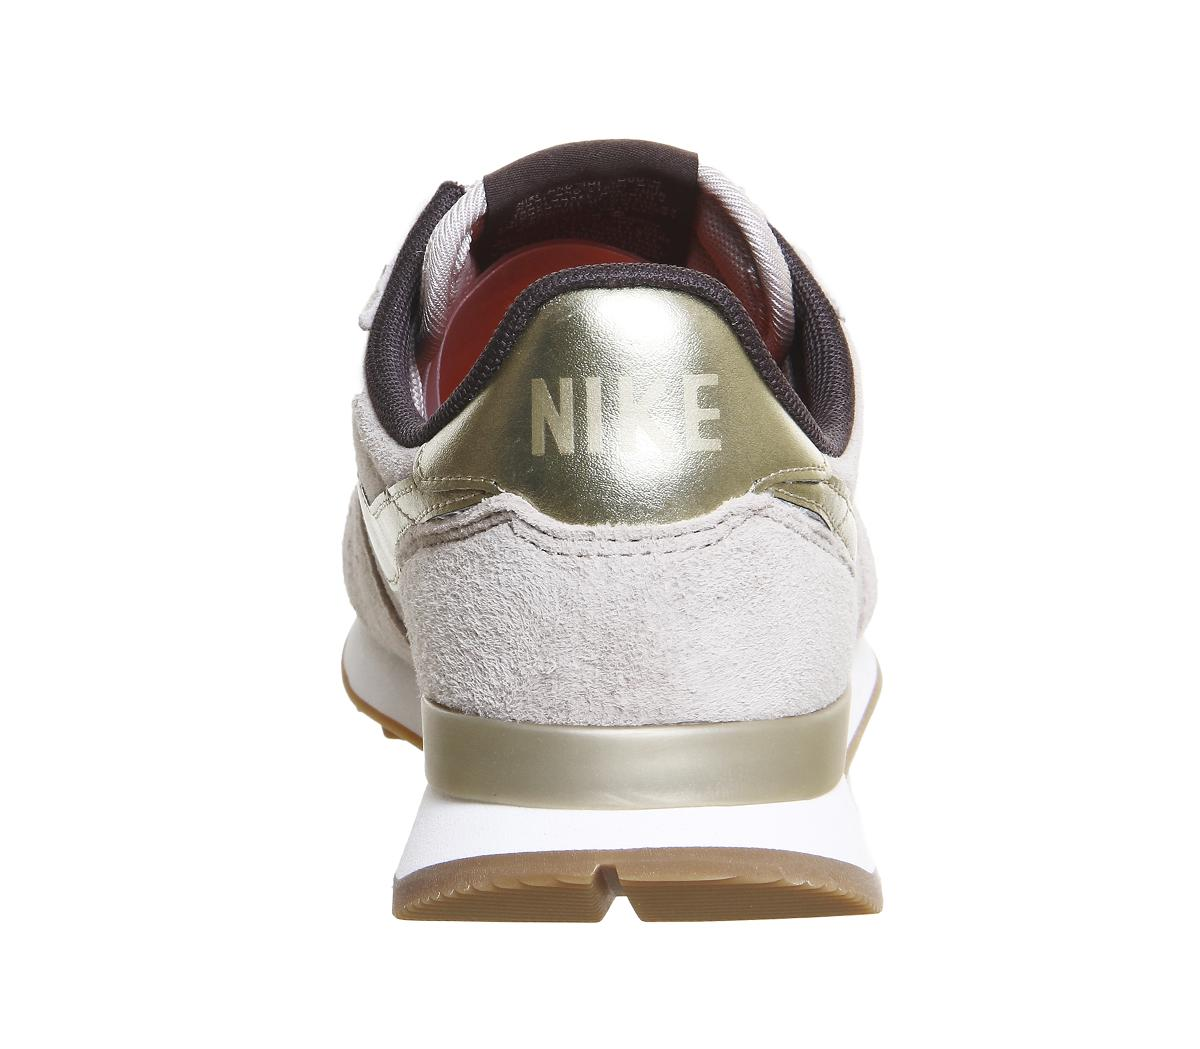 Nike Internationalist Suede Low-Top Sneakers in Gold (Natural) for Men